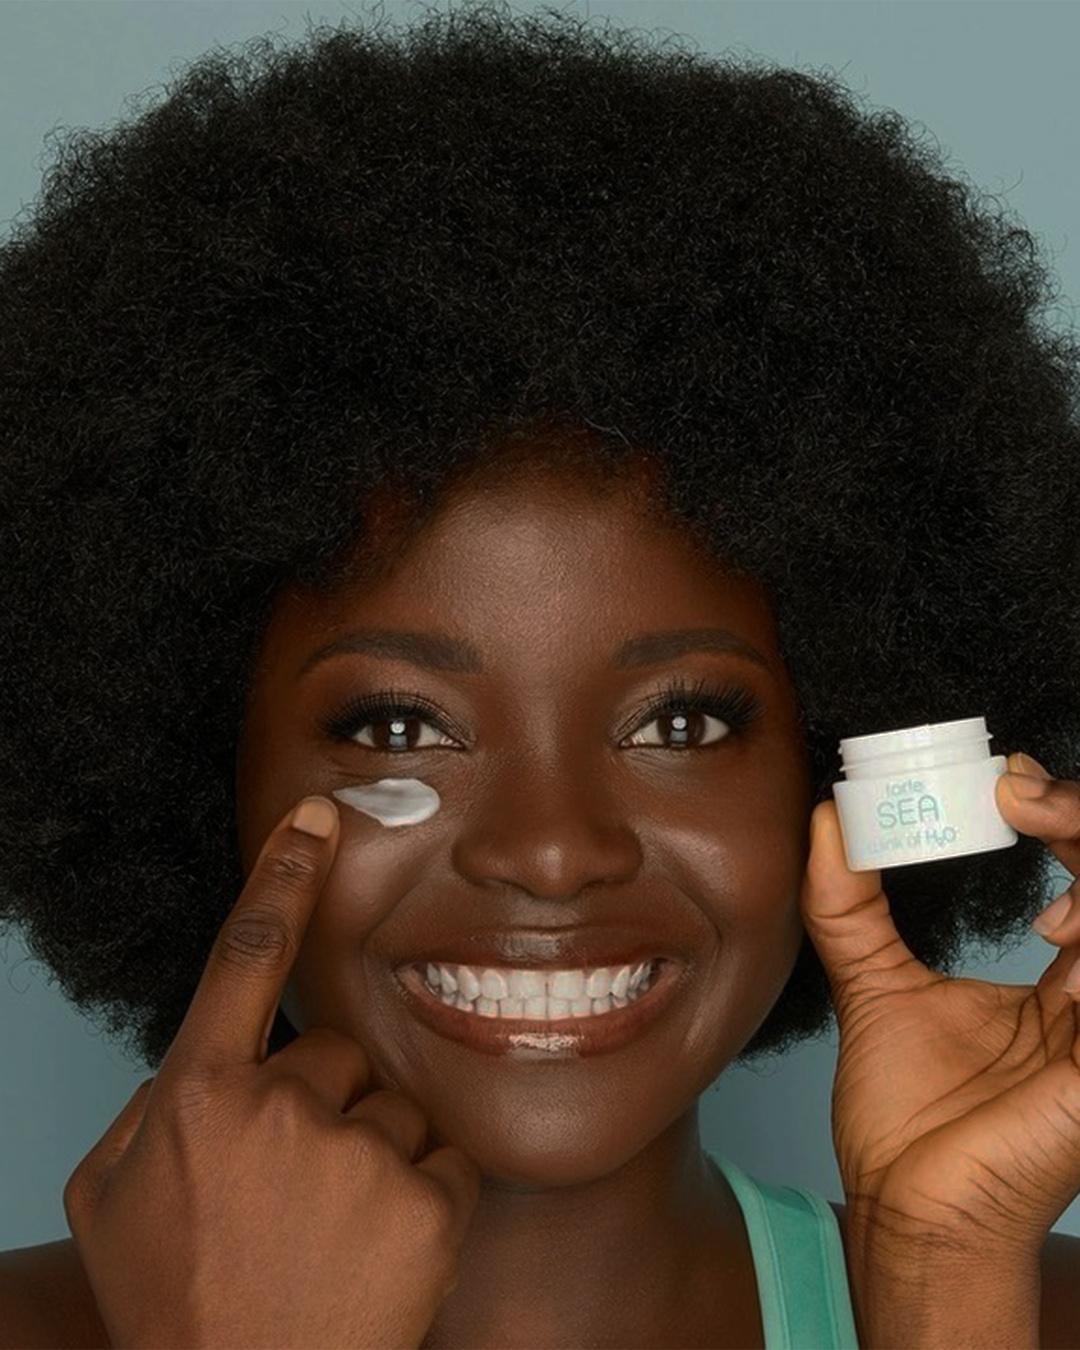 A model poses with Tarte, Sea, Wink H20 Vegan Collagen Eye Cream under one eye.